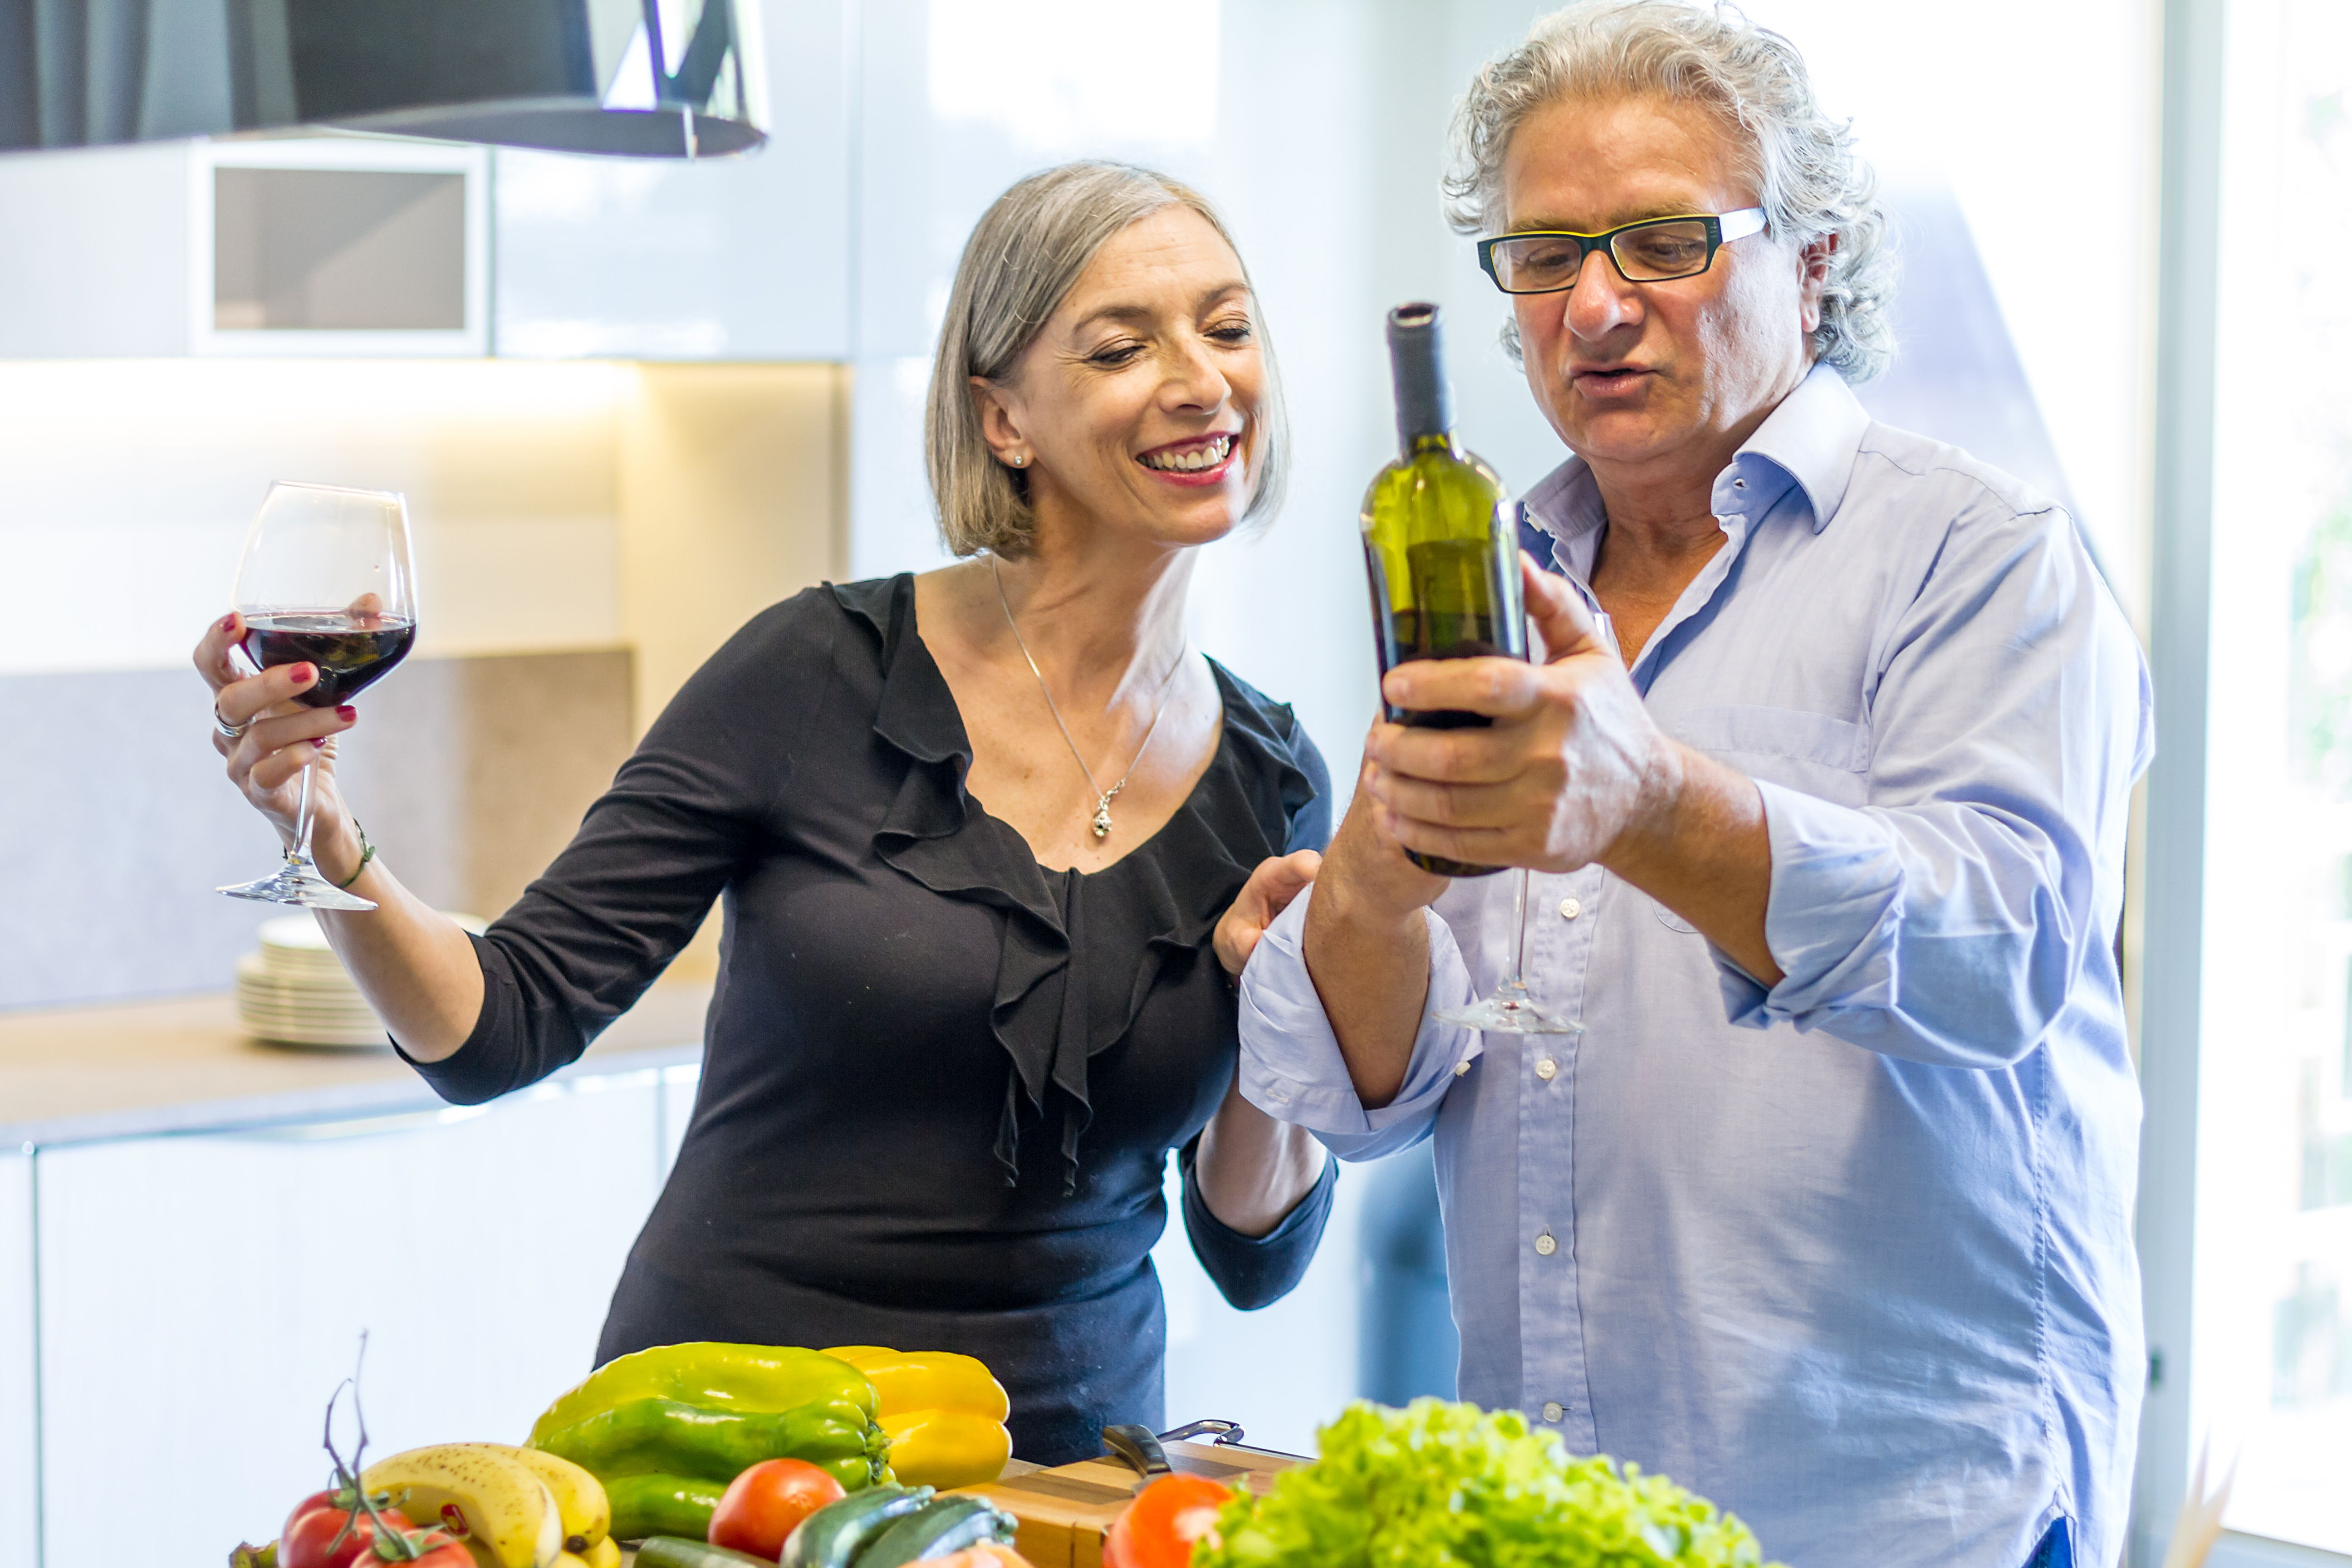 Couple of seniors tasting wine at home